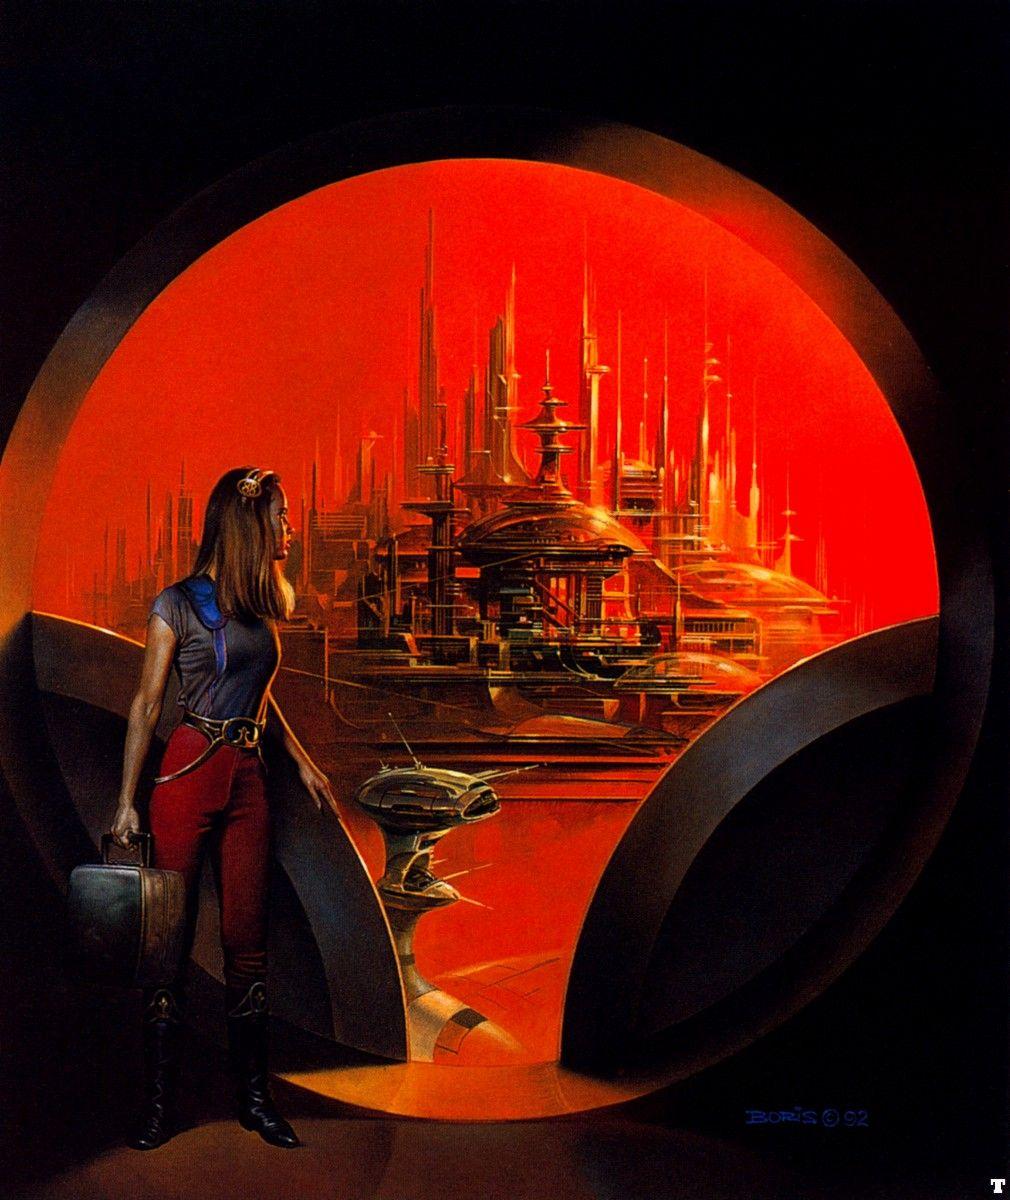 Vintage Sci Fi Illustrations Retro Science Fiction: Classic Sci Fi Illustrations #8 Boris